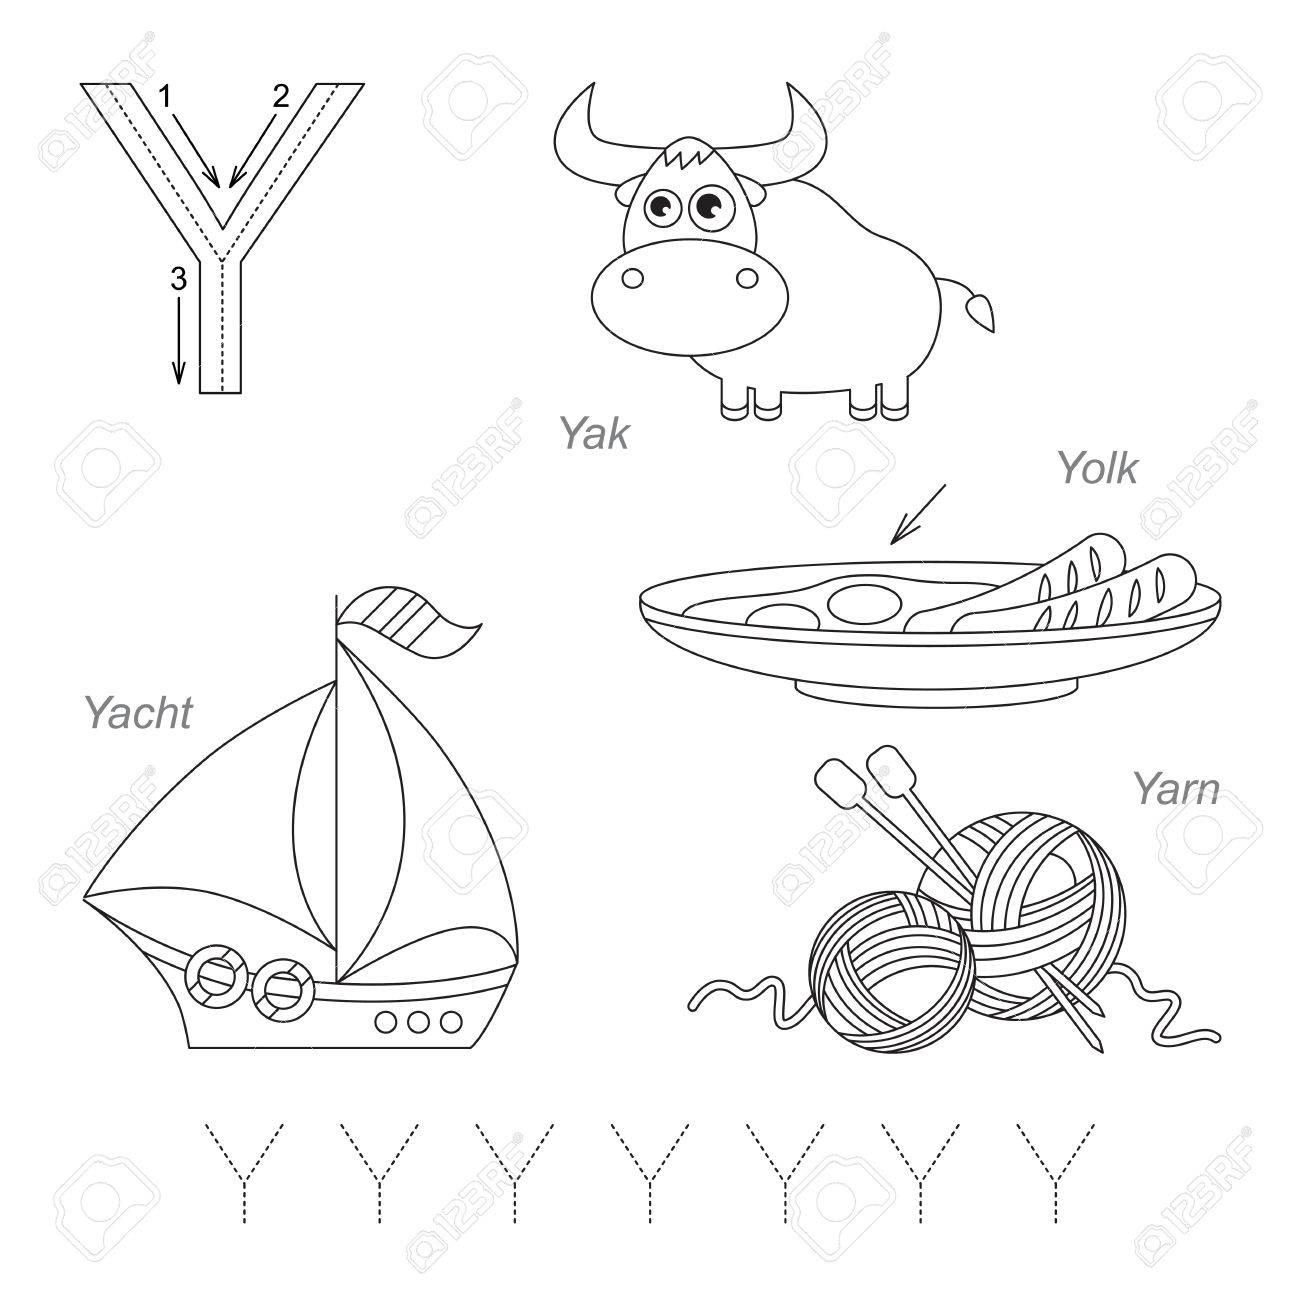 Contemporary Letter Y Arbeitsblatt Tracing Images - Kindergarten ...